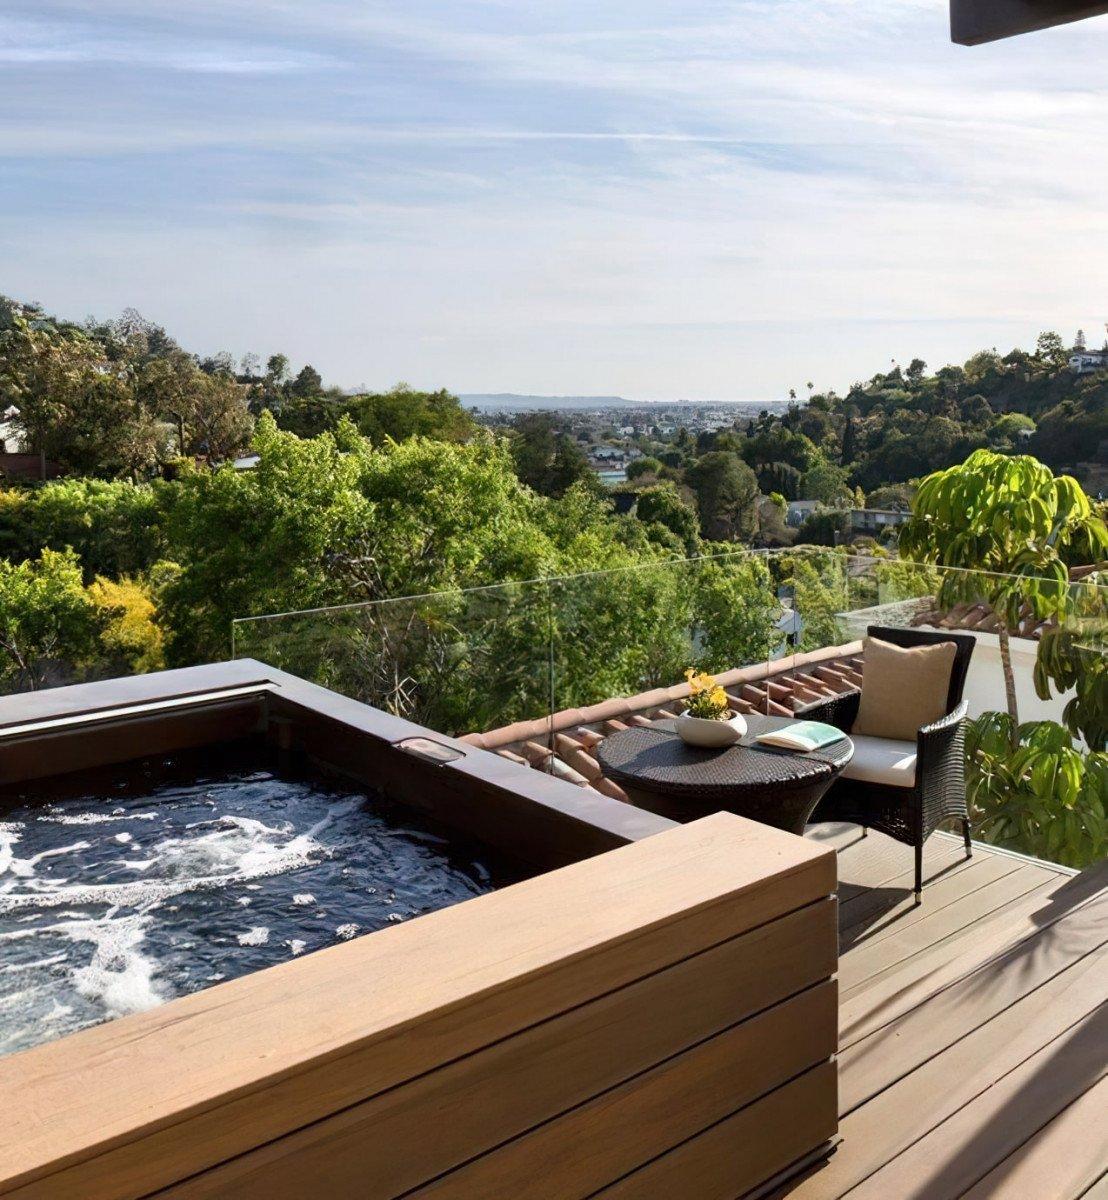 EsionSilenceProperty - Historic Luxury Apartment - Interior - Terrace - Wooden Bathtub